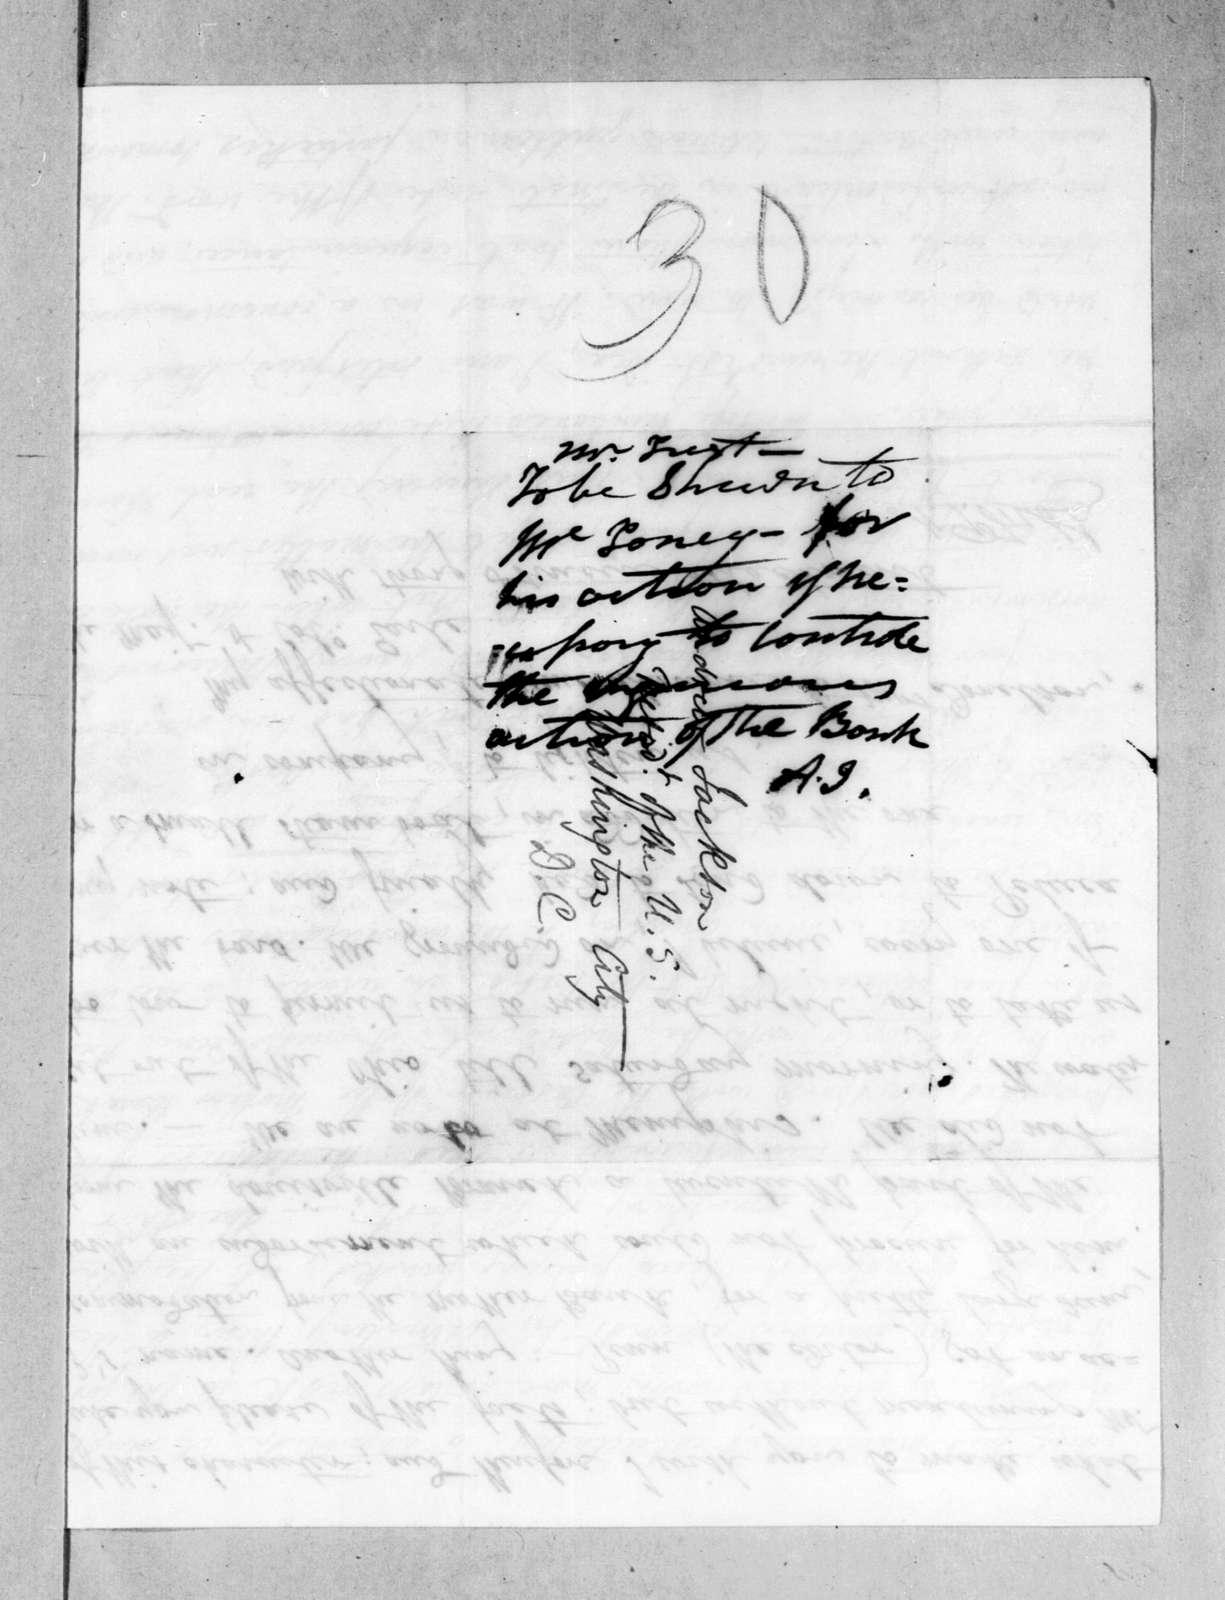 Nicholas Phillip Trist to Andrew Jackson, December 22, 1833